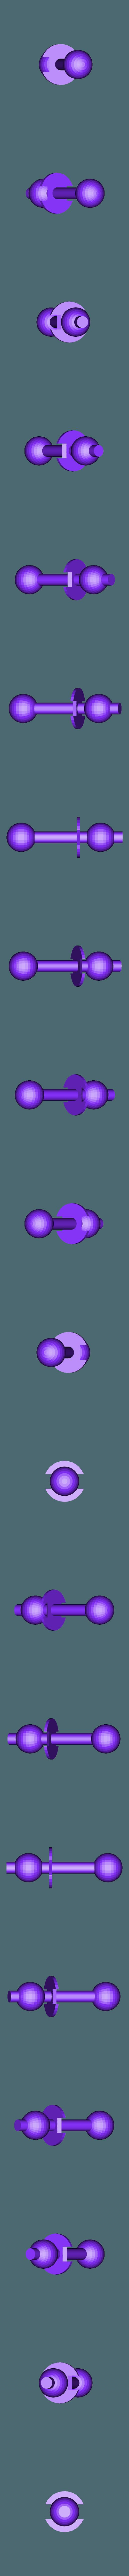 Joystick.stl Download free STL file MARBLE BOY automat • 3D printer object, Janis_Bruchwalski